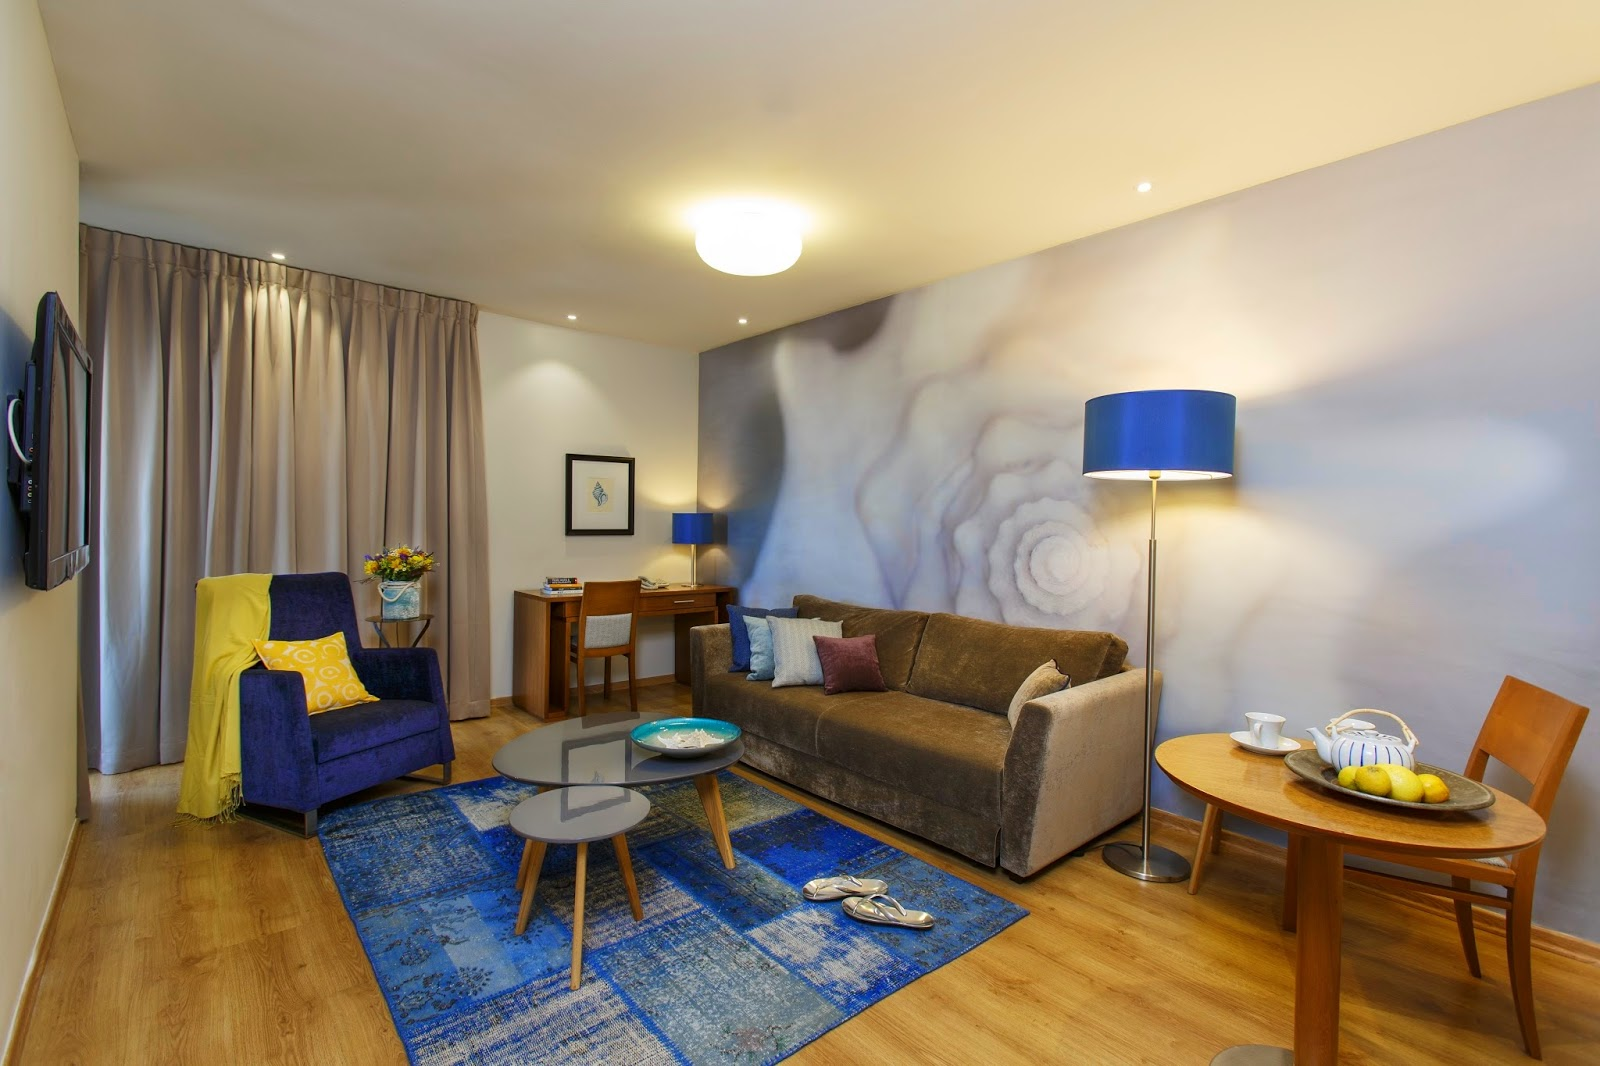 The lusky great small hotel in tel aviv